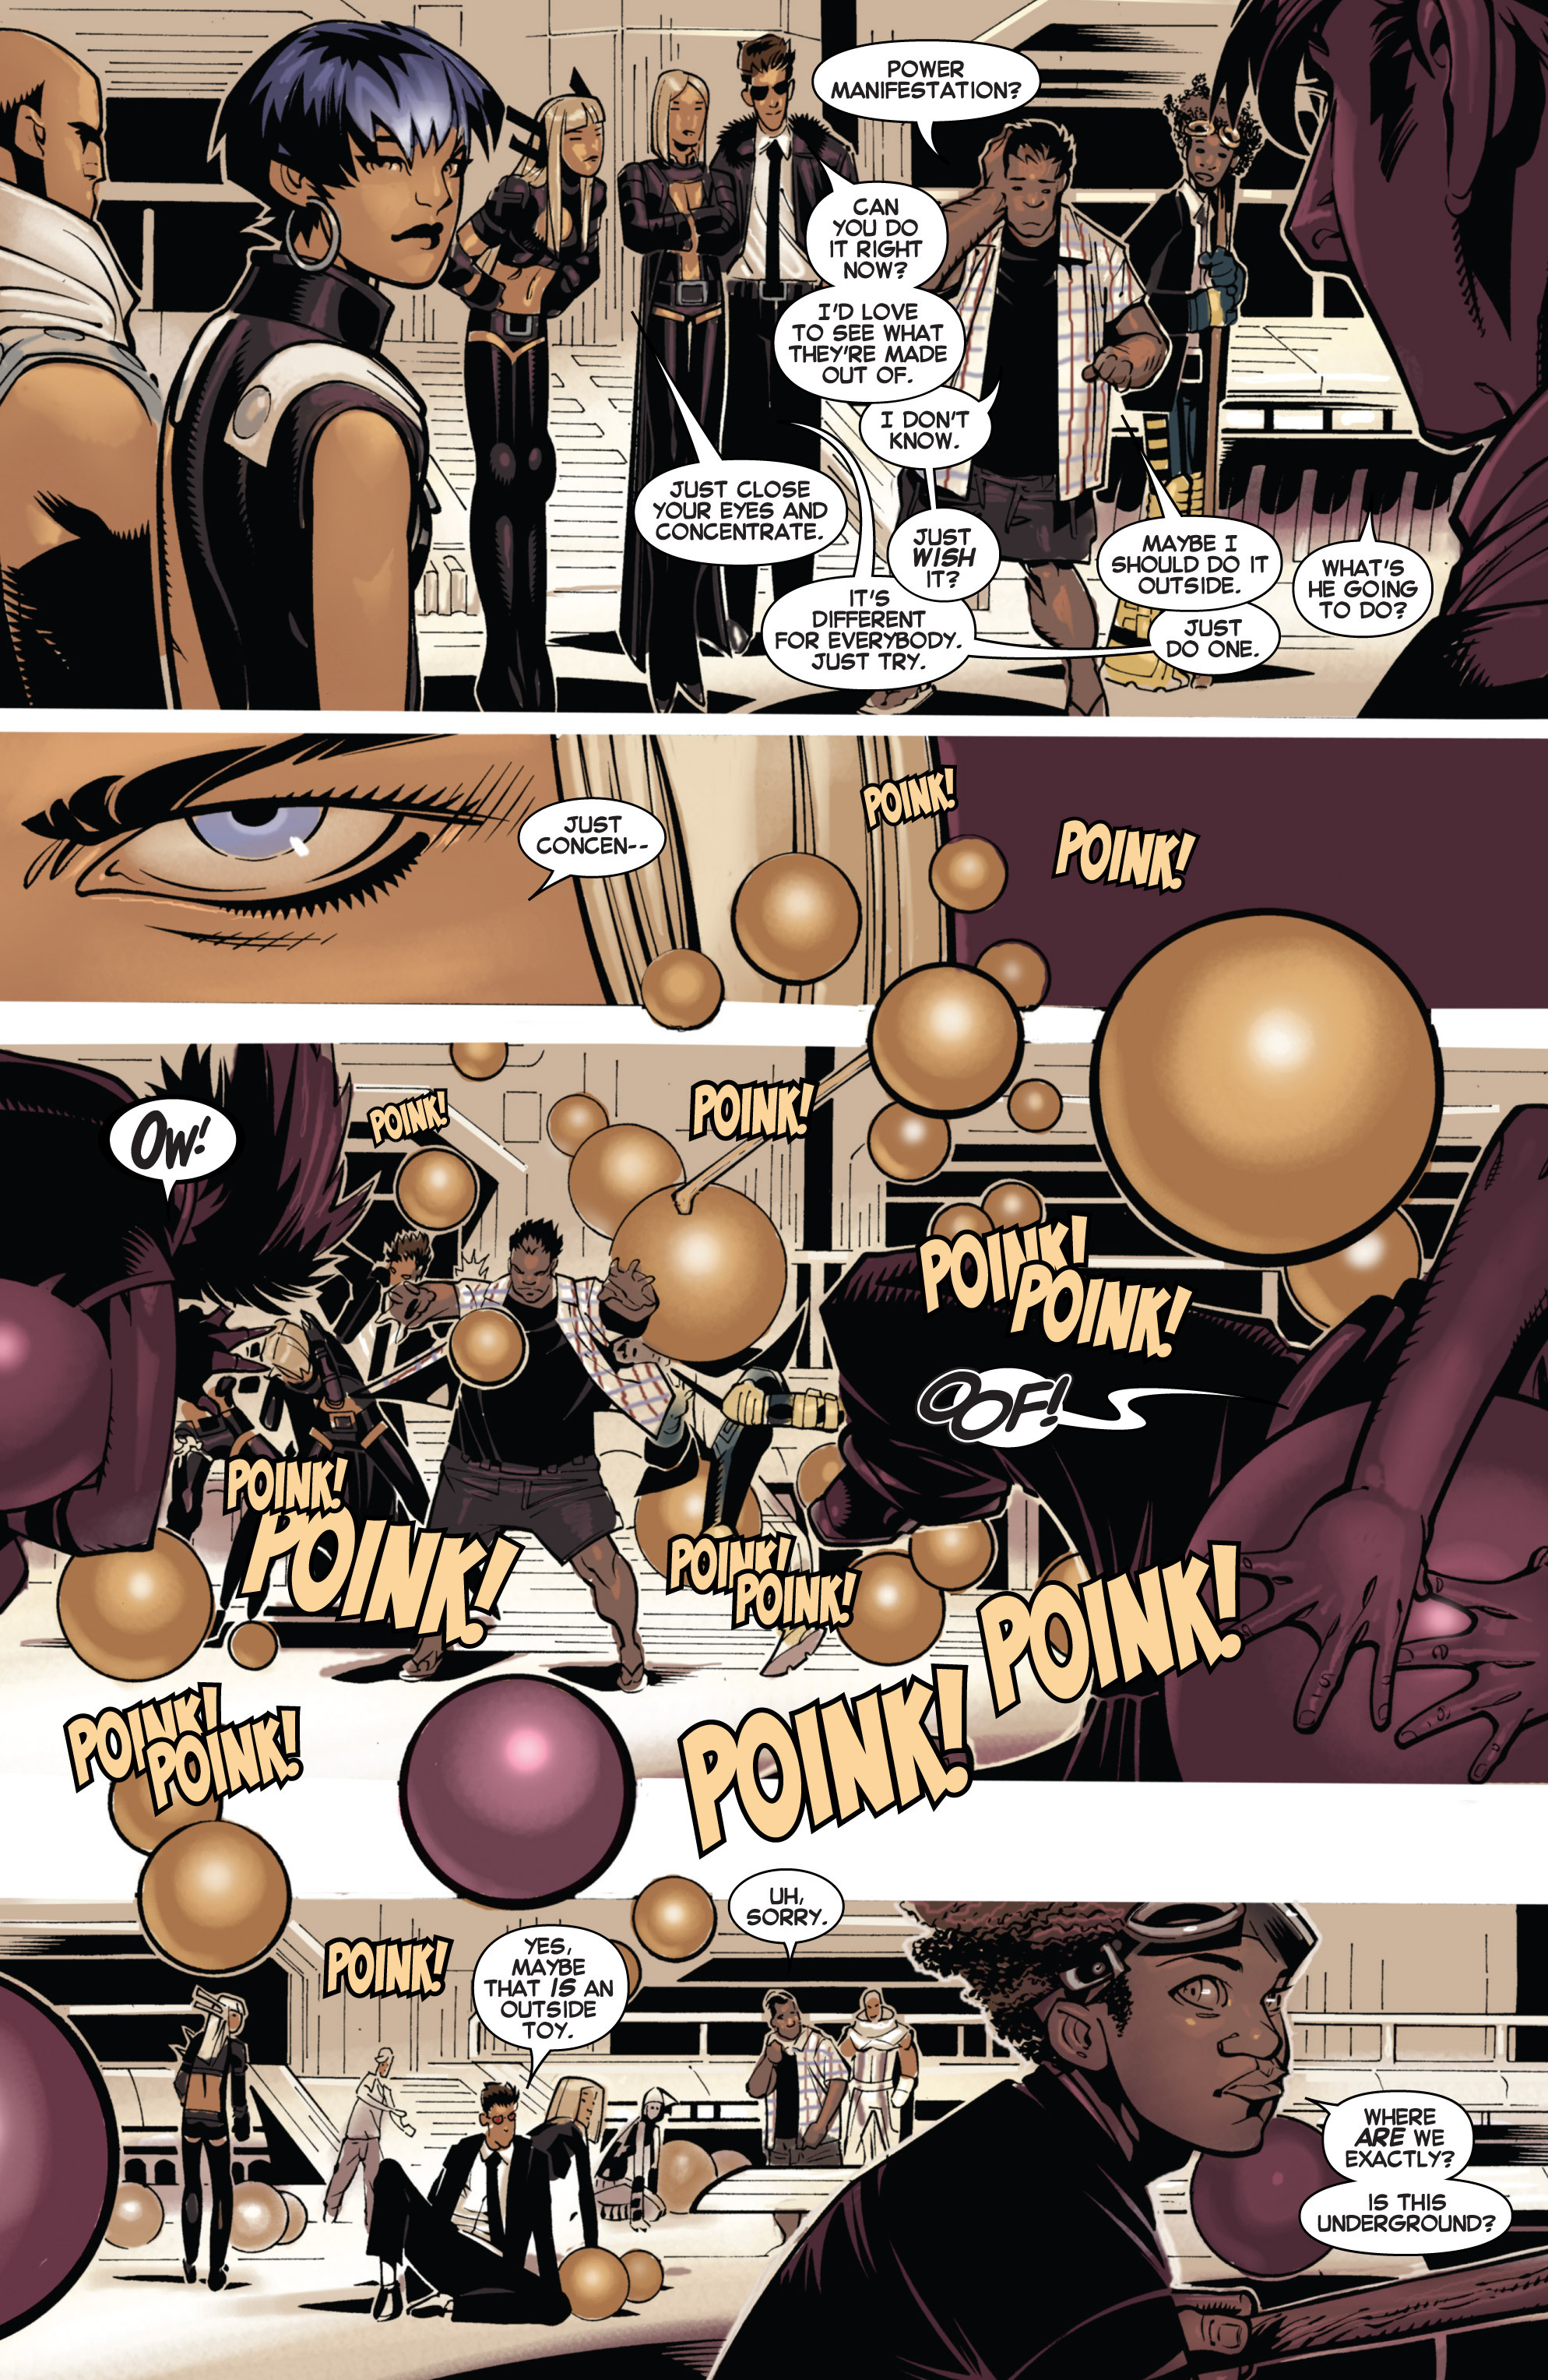 Read online Uncanny X-Men (2013) comic -  Issue # _TPB 1 - Revolution - 36